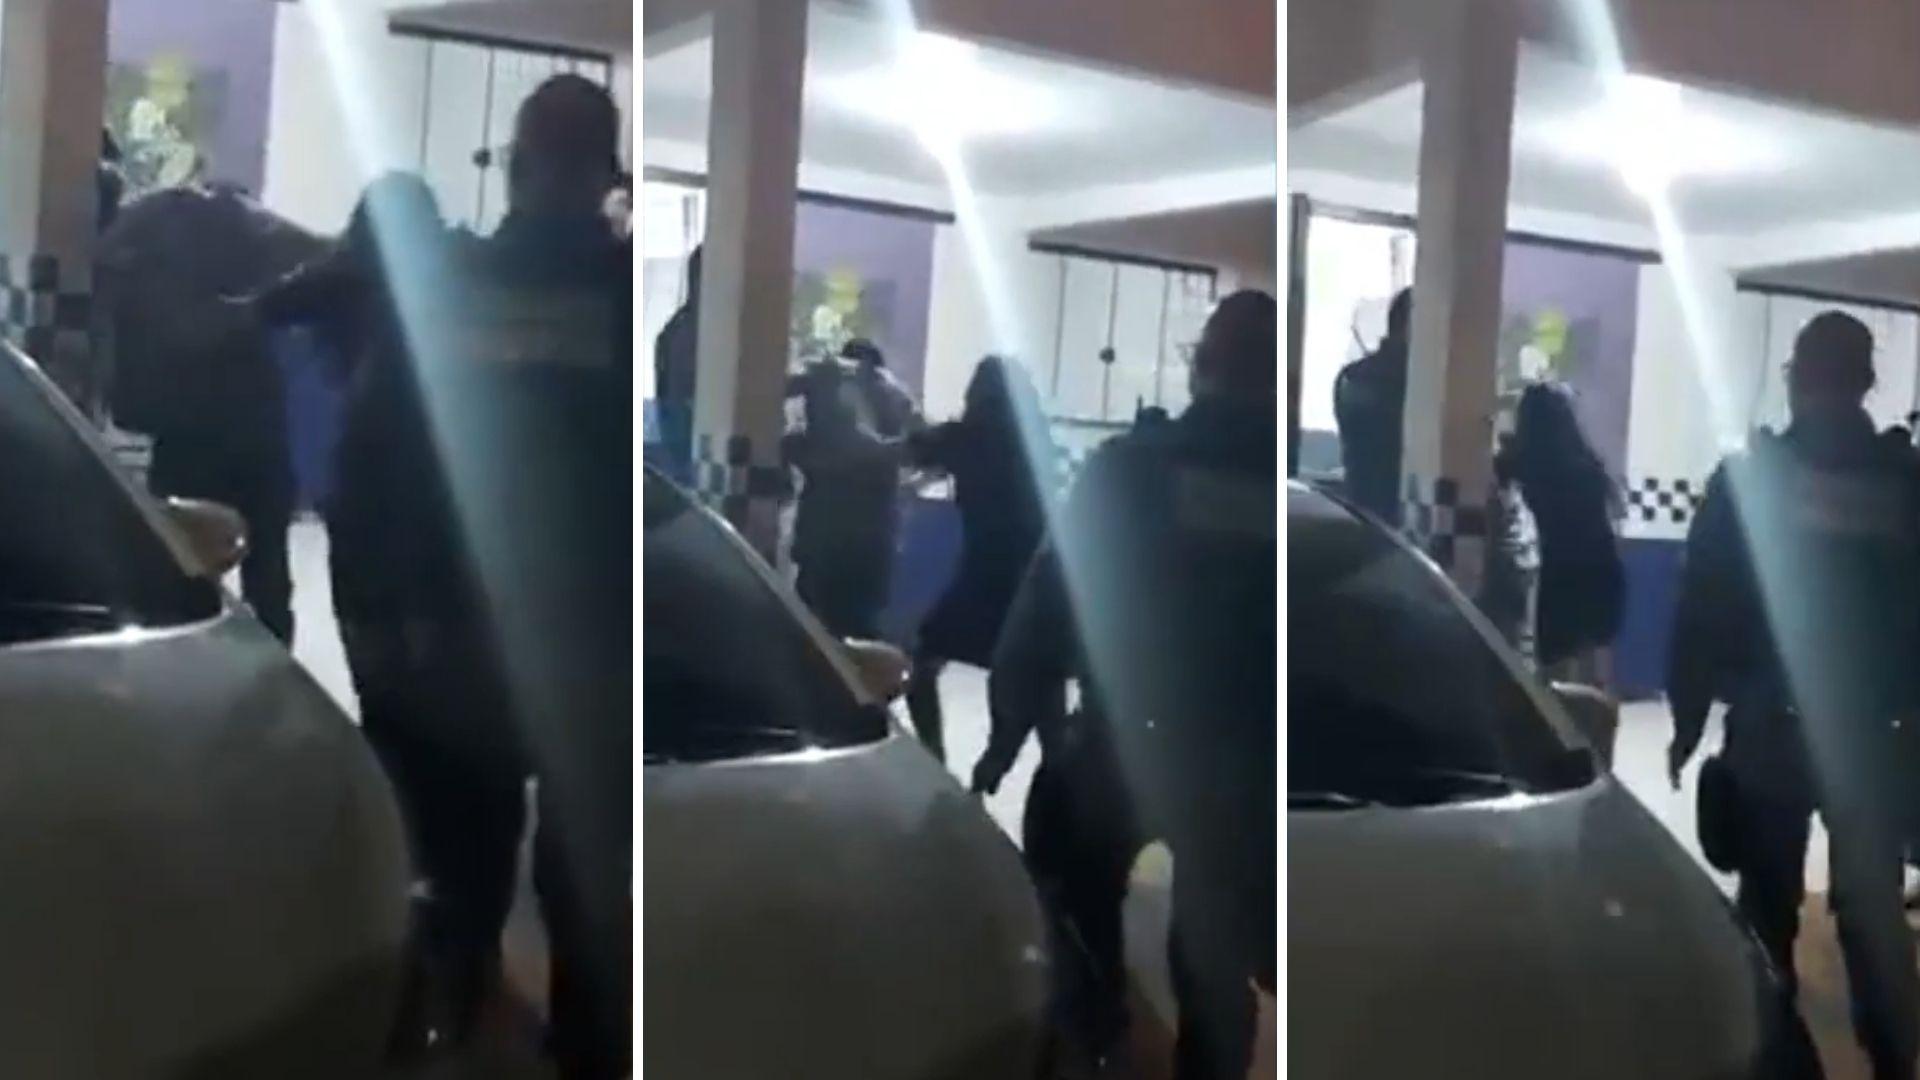 Sequestrador de motorista é preso e leva surra da mãe. Vídeo!